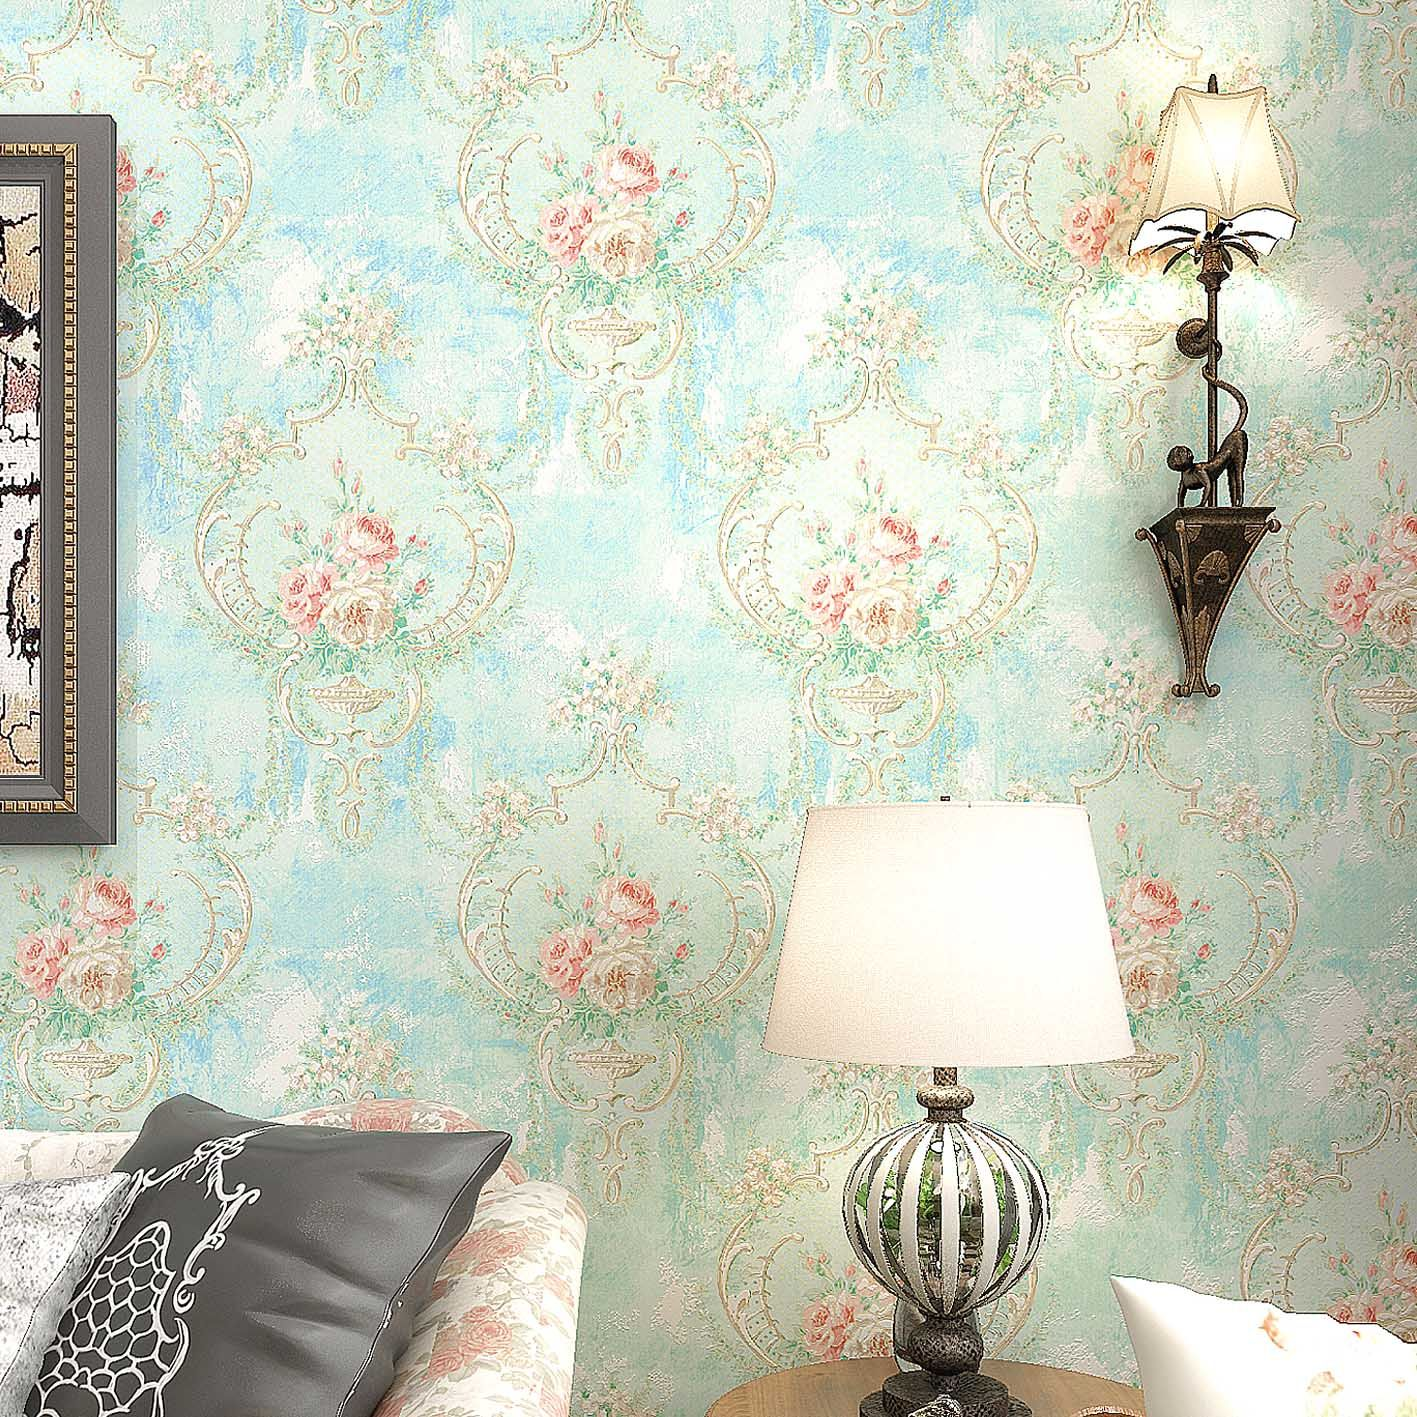 American Style Rustic Vintage Wallpaper Romantic Floral